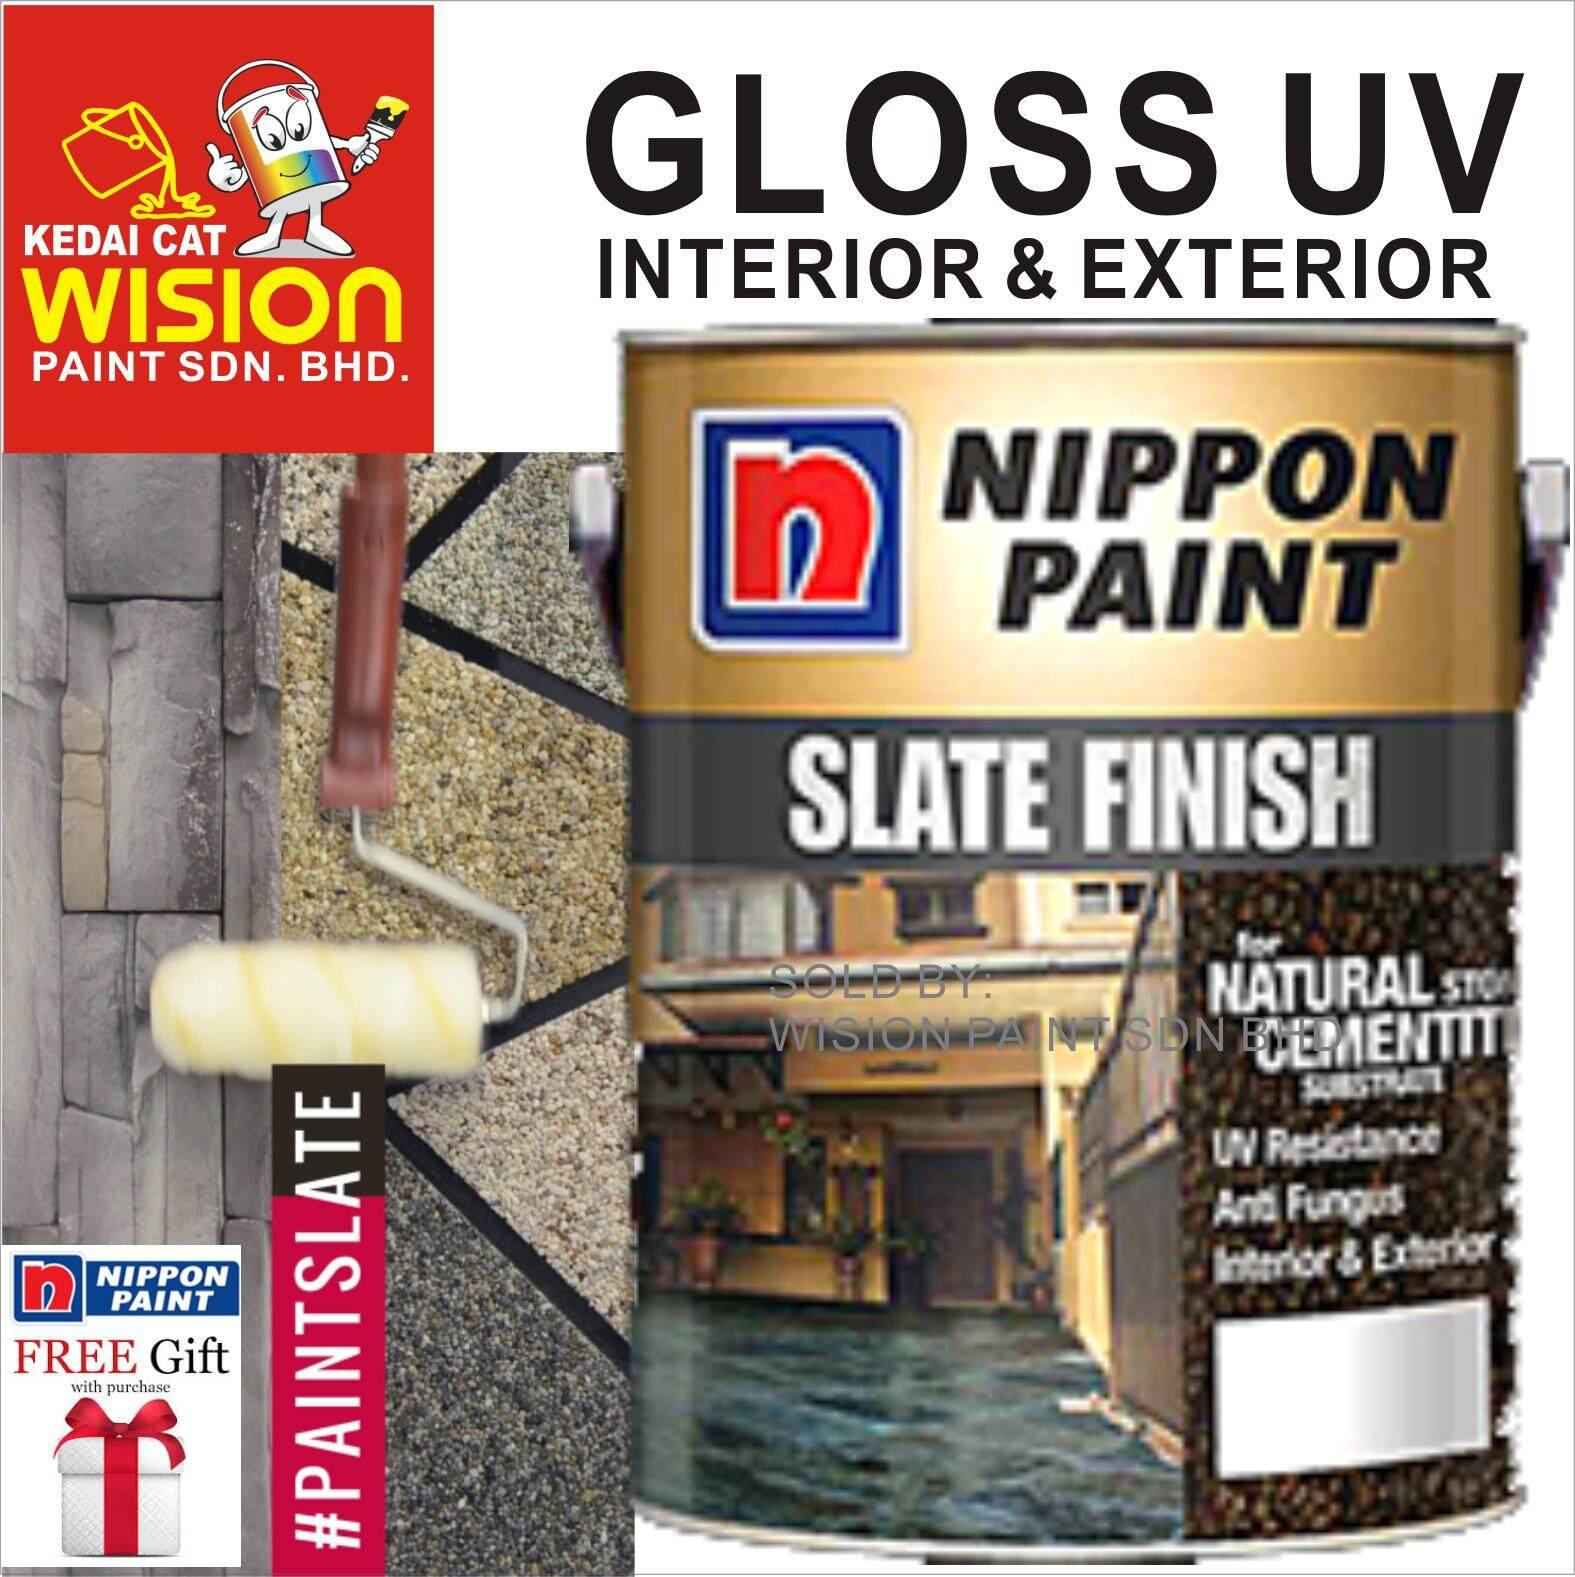 GLOSS SLATE FINISH (1L) NIPPON PAINT STONE GLOSS PAINT